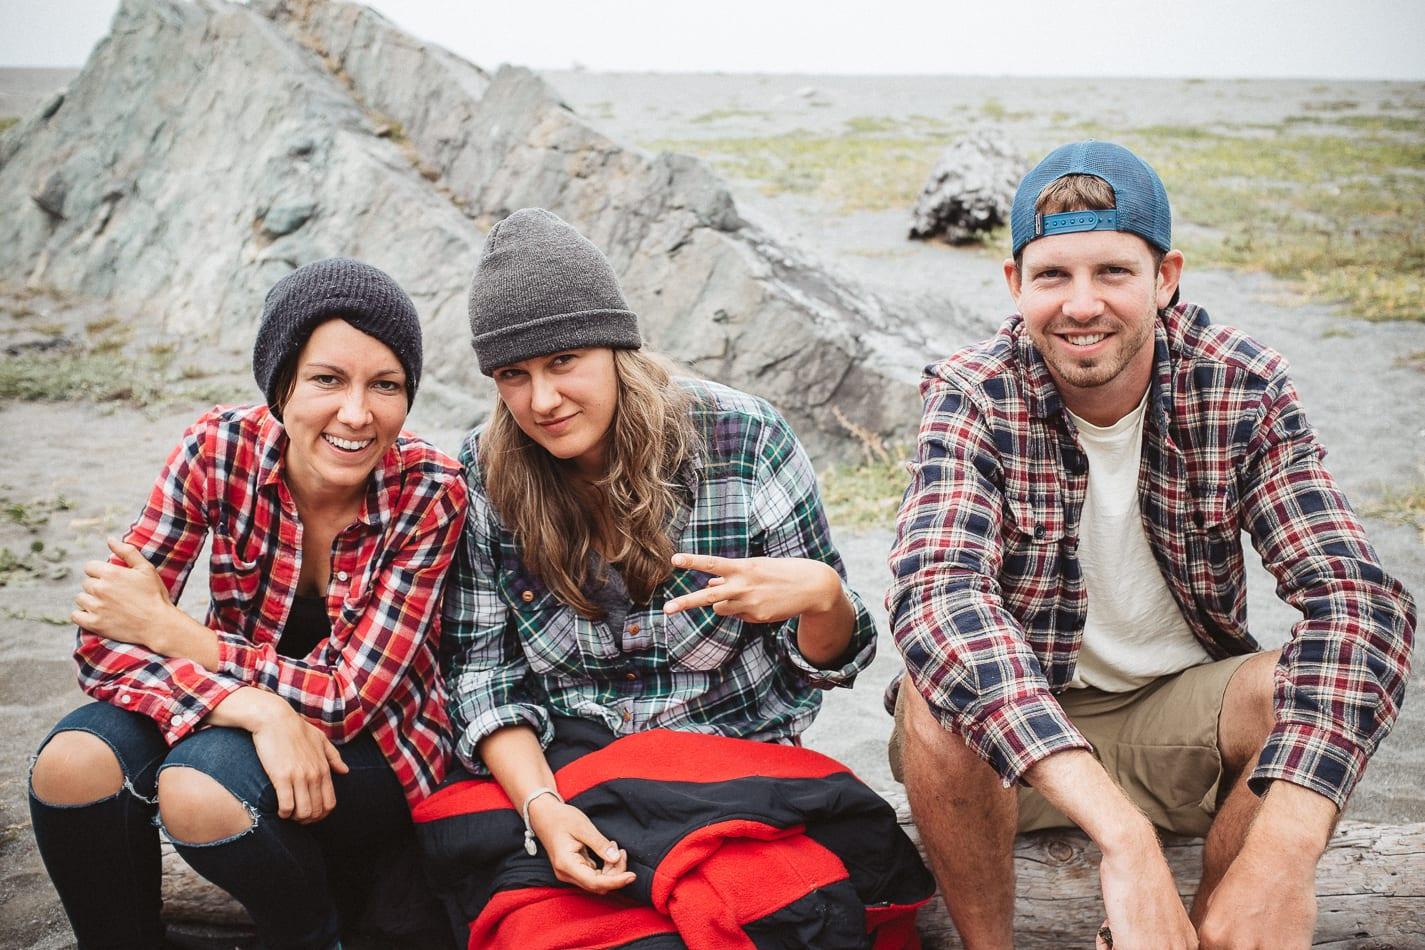 patricks-point-beach-camping-california-adventure-photographer-2